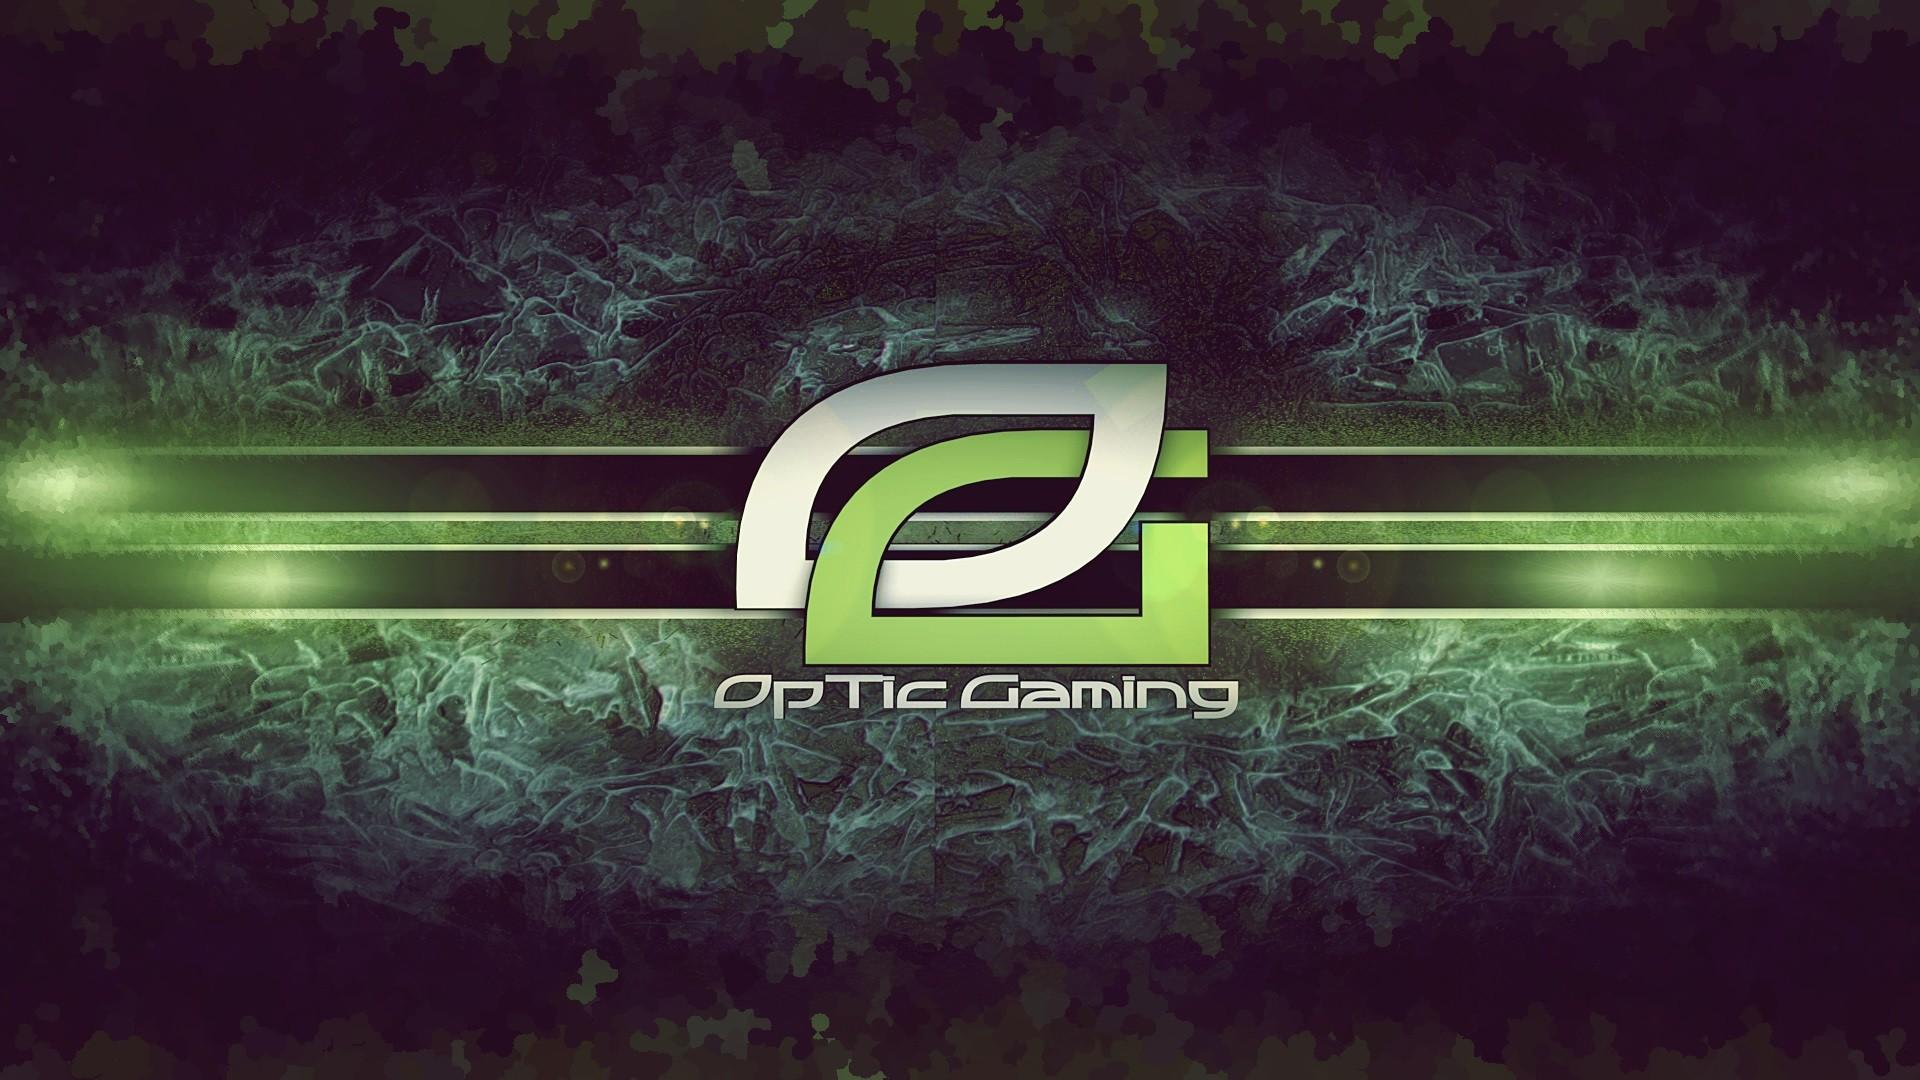 Optic Gaming Wallpaper Optic Gaming Wallpaper by